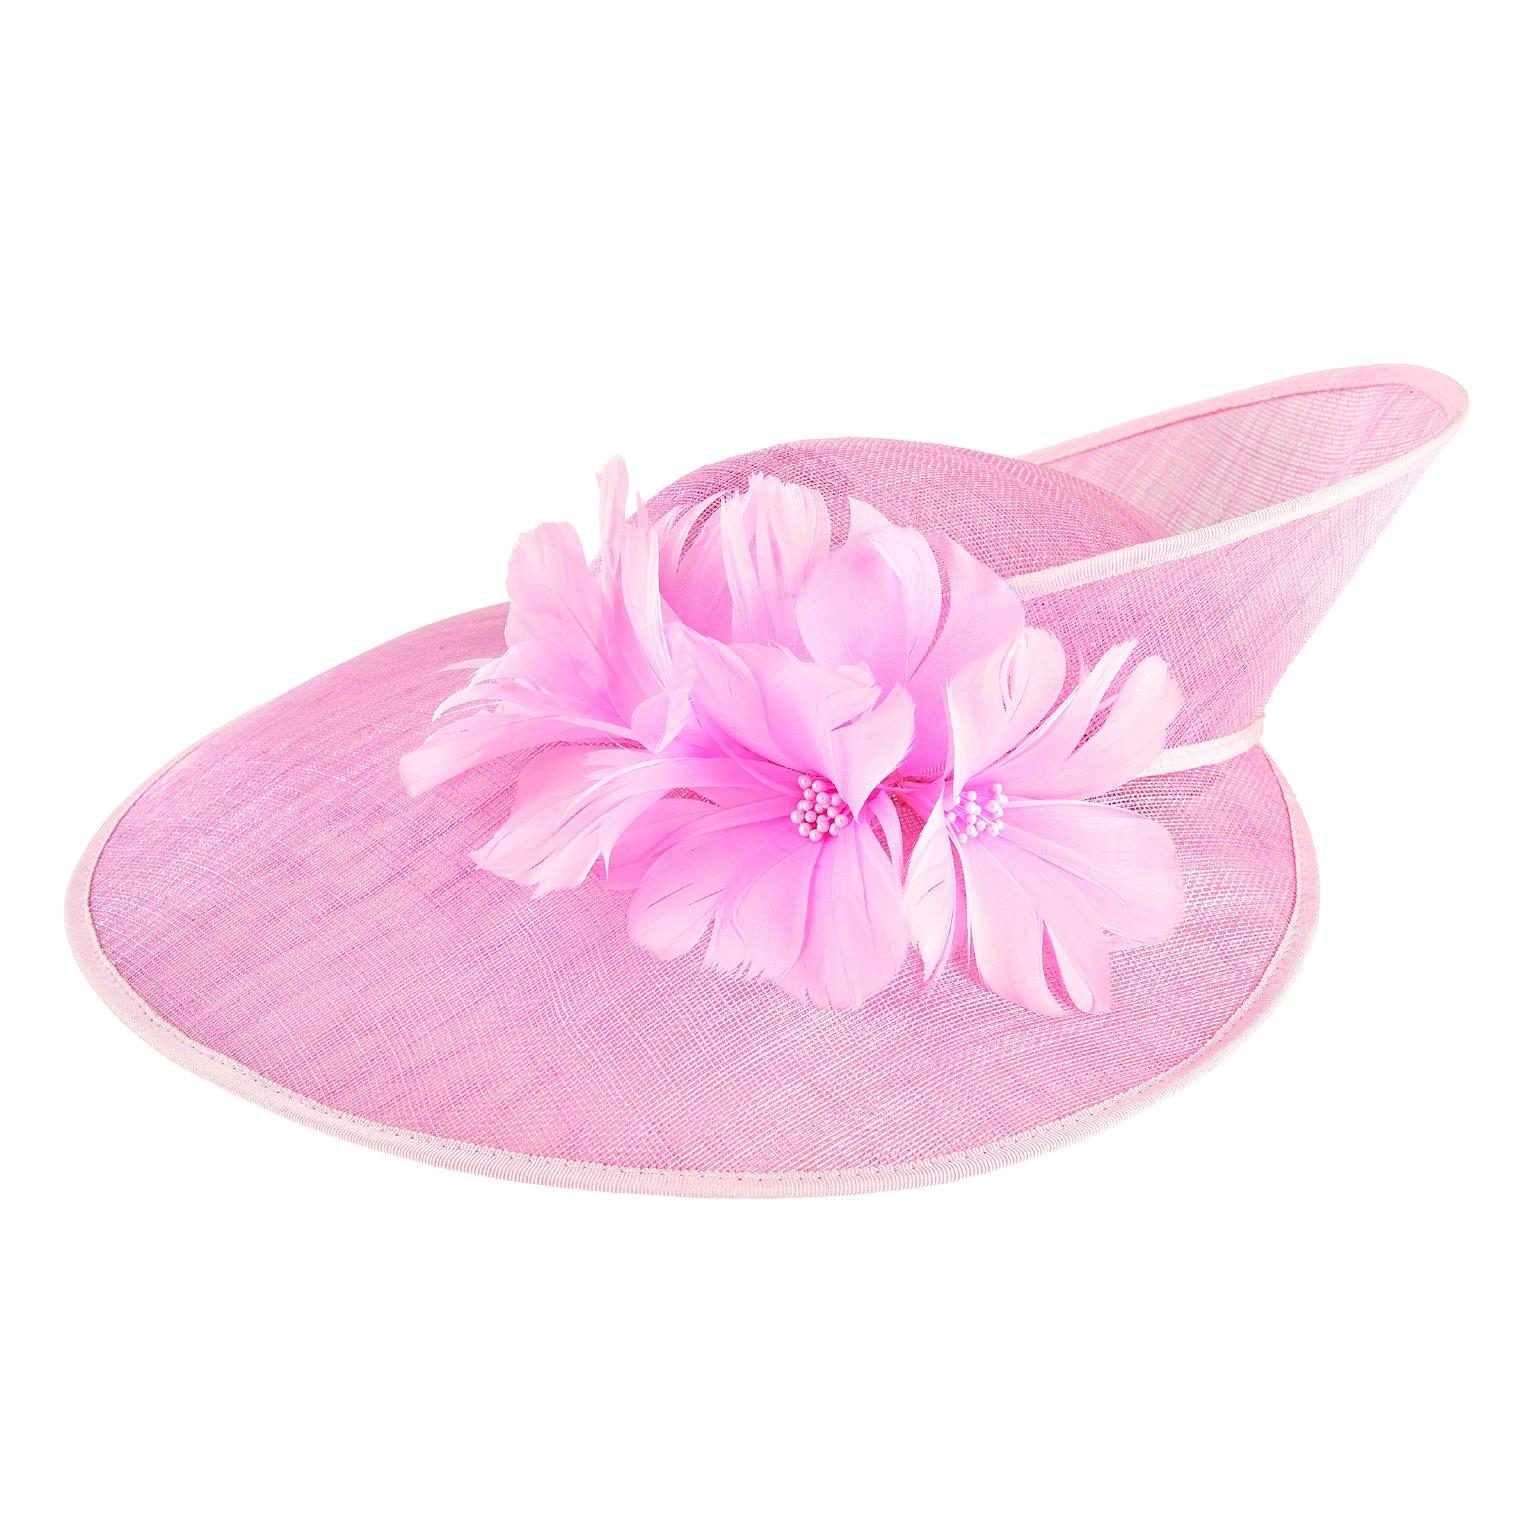 San Diego Hat Company Women's Twisted Brim Sinamay Fascinator Hat, Pink, OS